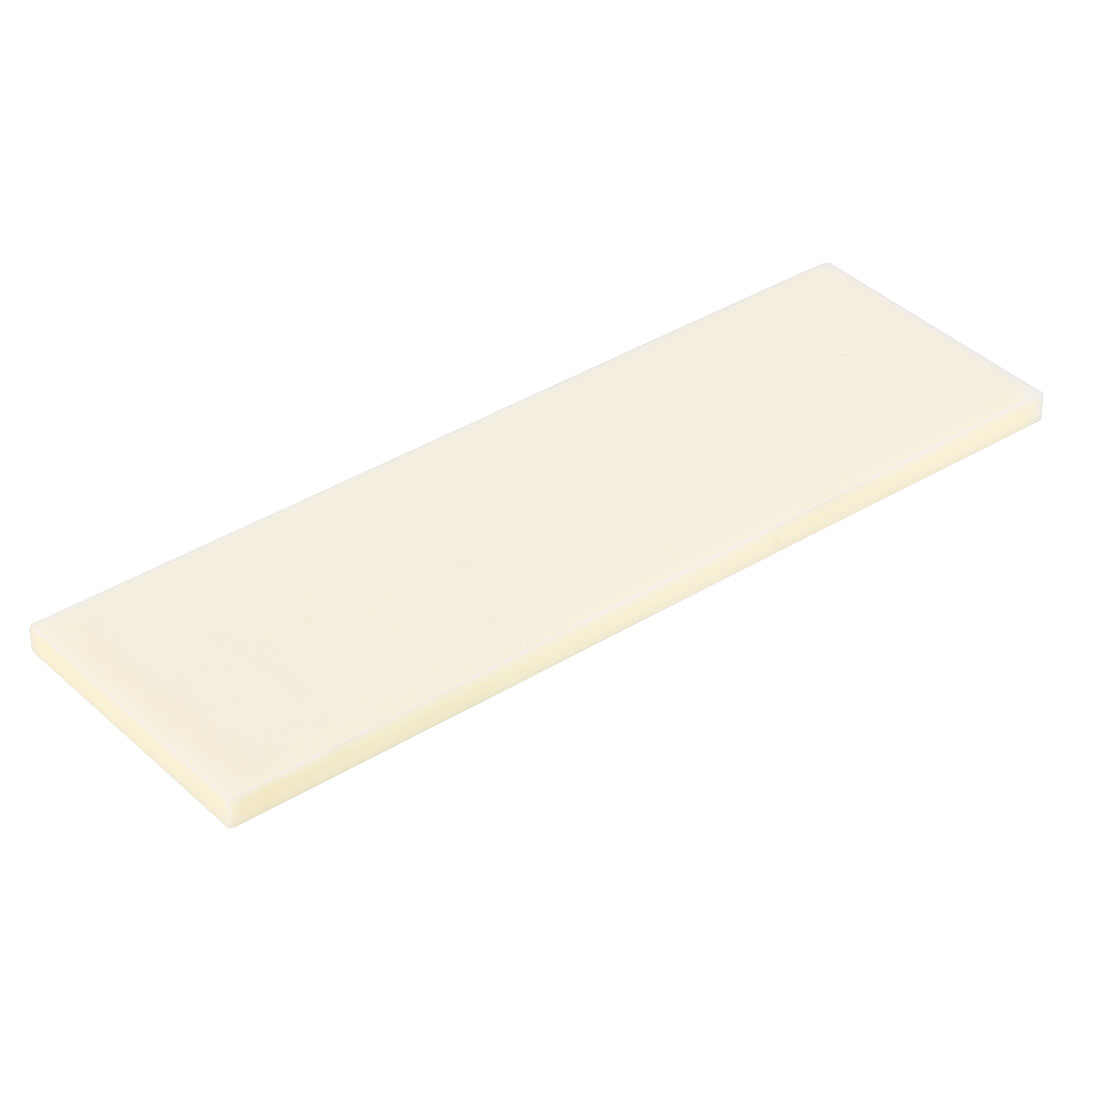 Soldering Board Ceramic Insulation Board 4 x 1.26 x 0.14inch/102 x 32 x 3.5mm